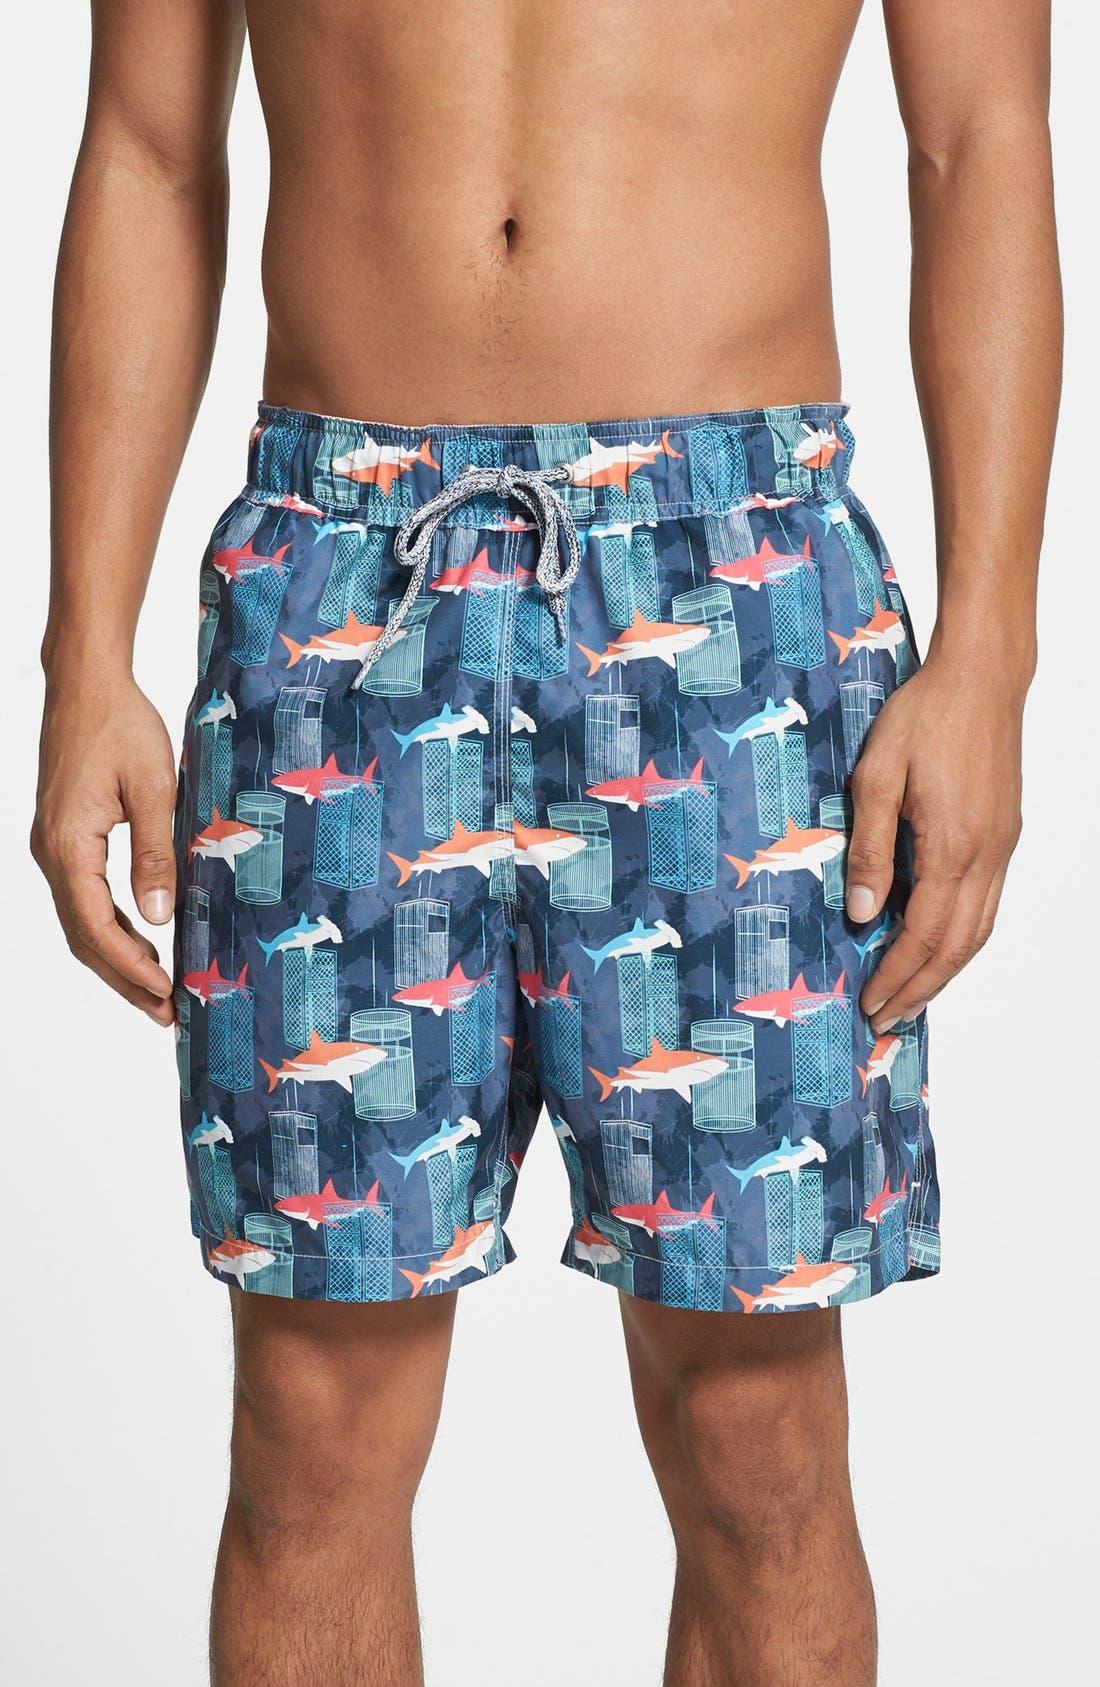 Alternate Image 1 Selected - Michael's Swimwear 'Shark Tank' Swim Trunks